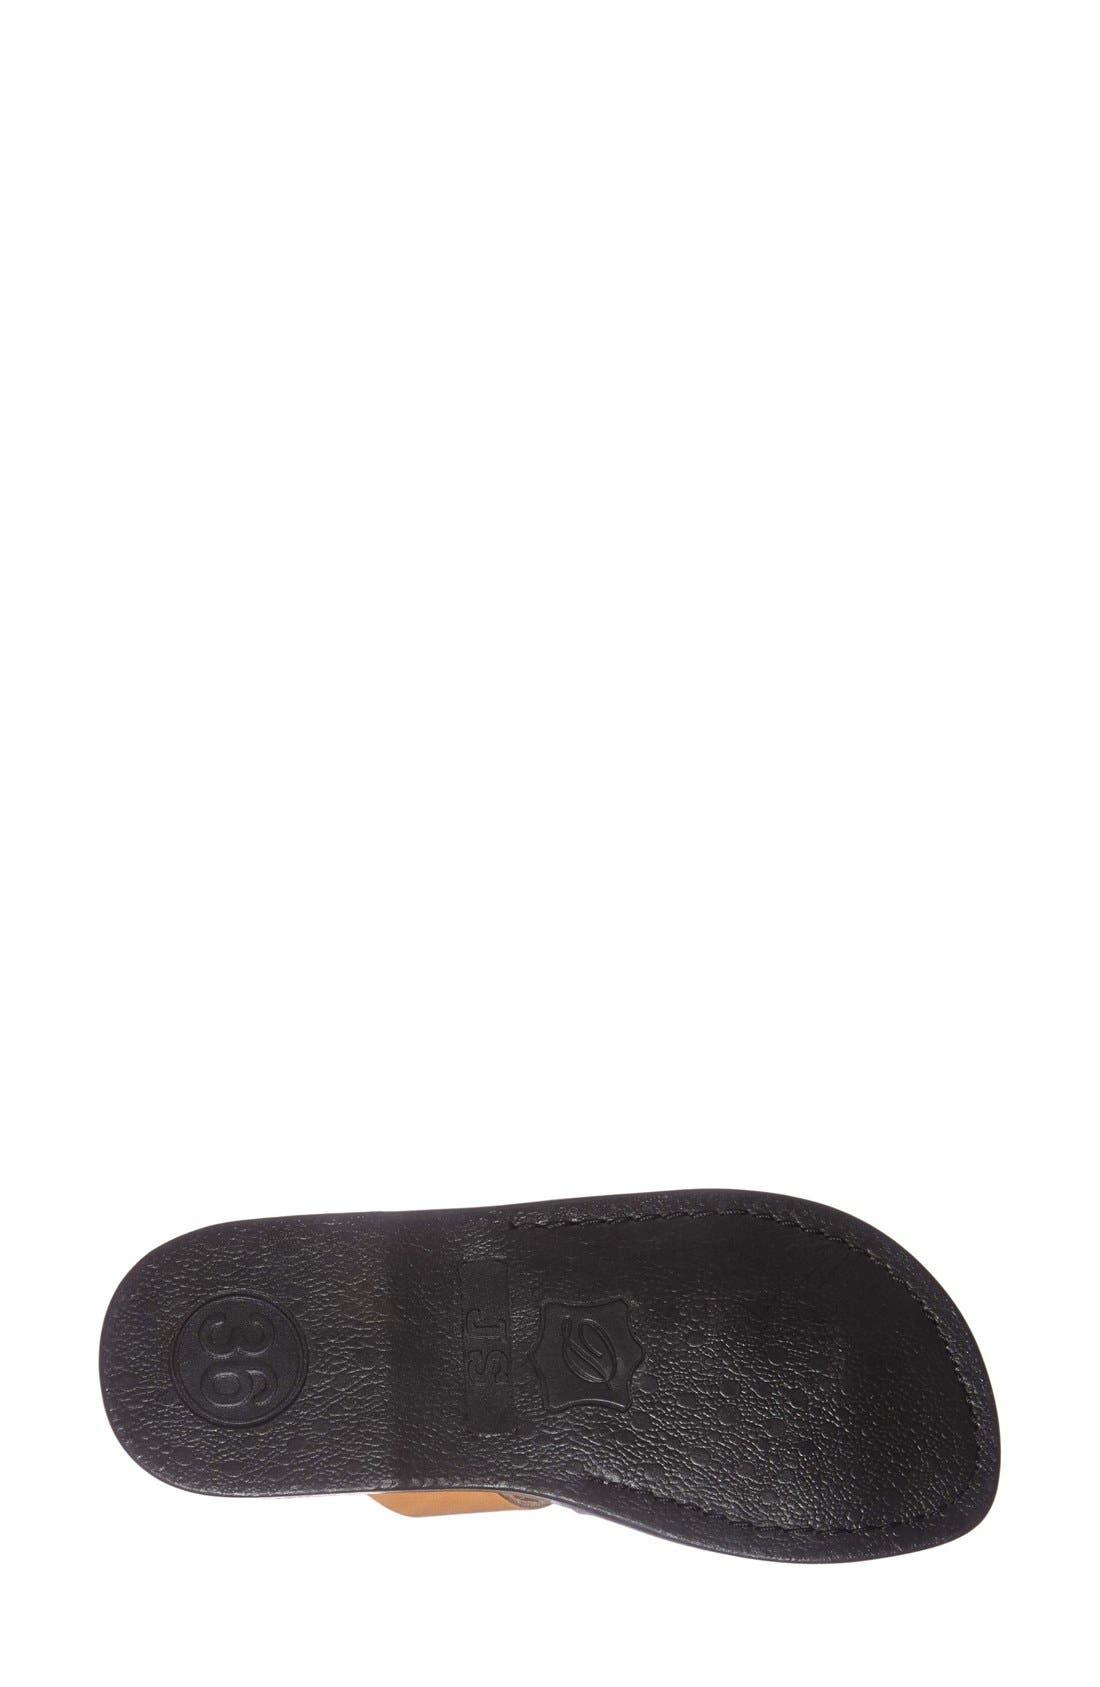 Alternate Image 4  - Jerusalem Sandals 'The Good Shepard' Leather Sandal (Women)